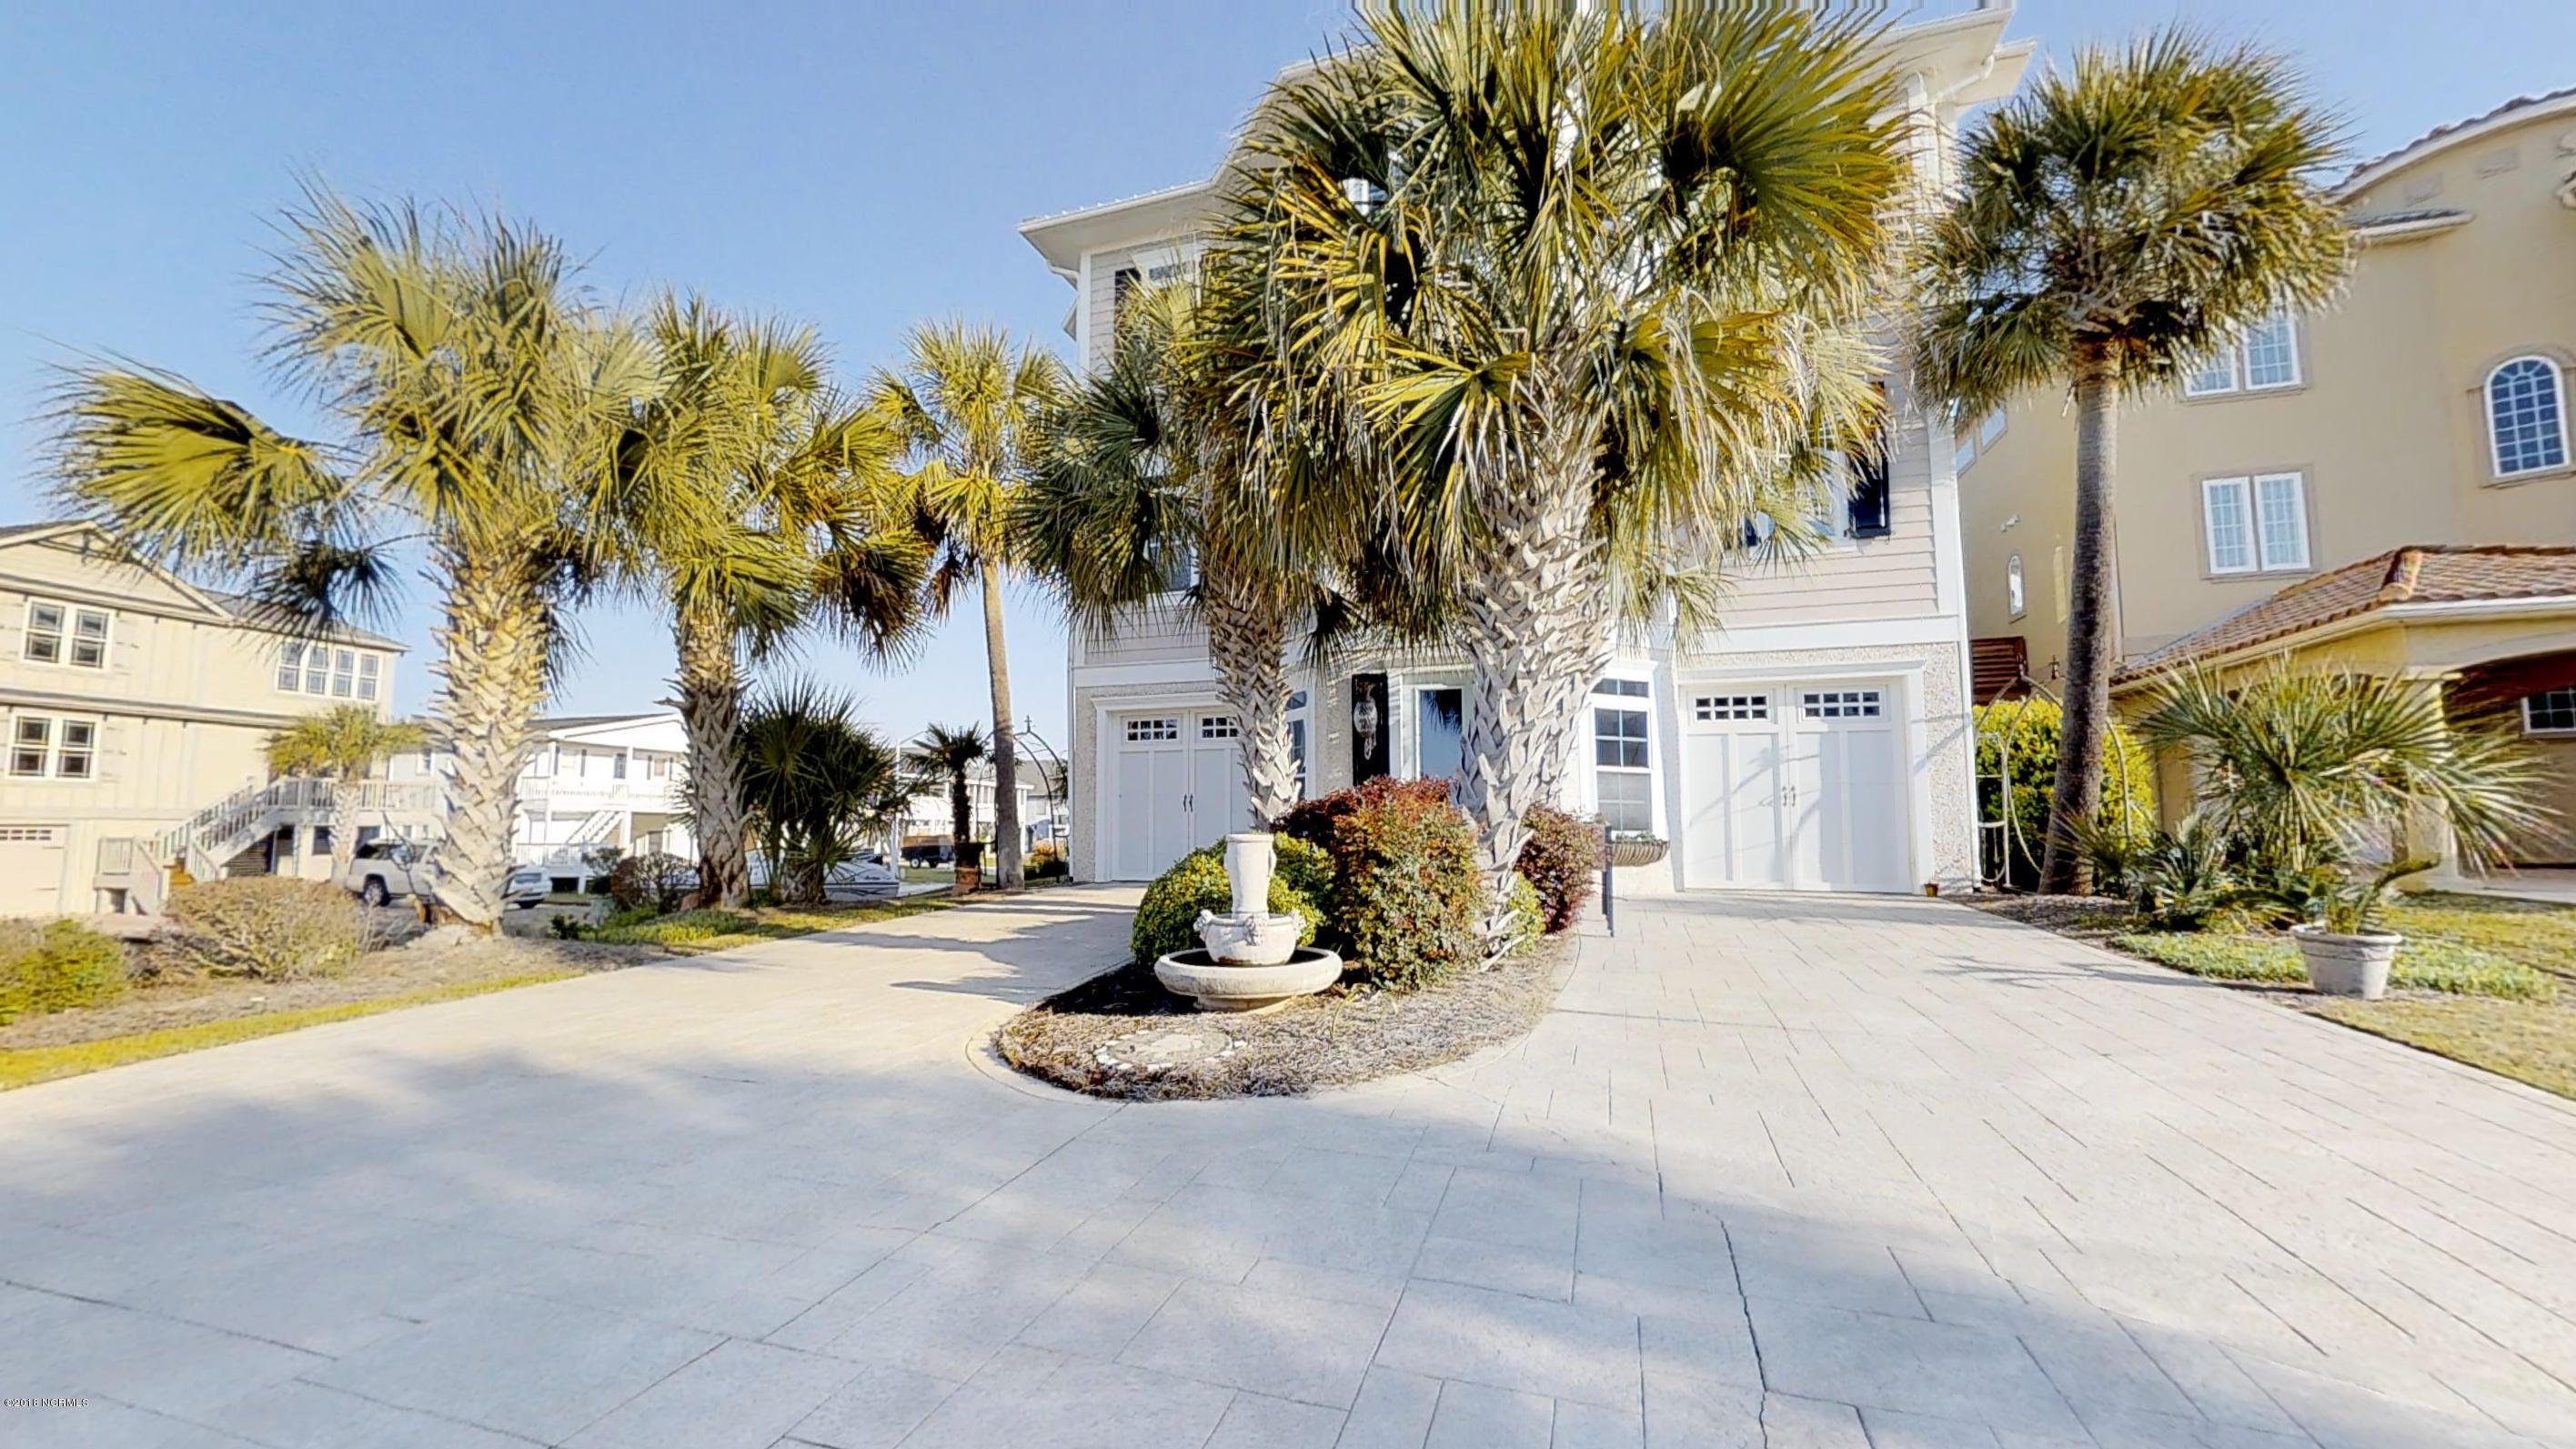 Ocean Isle Beach Real Estate - http://cdn.resize.sparkplatform.com/ncr/1024x768/true/20180414120434810118000000-o.jpg